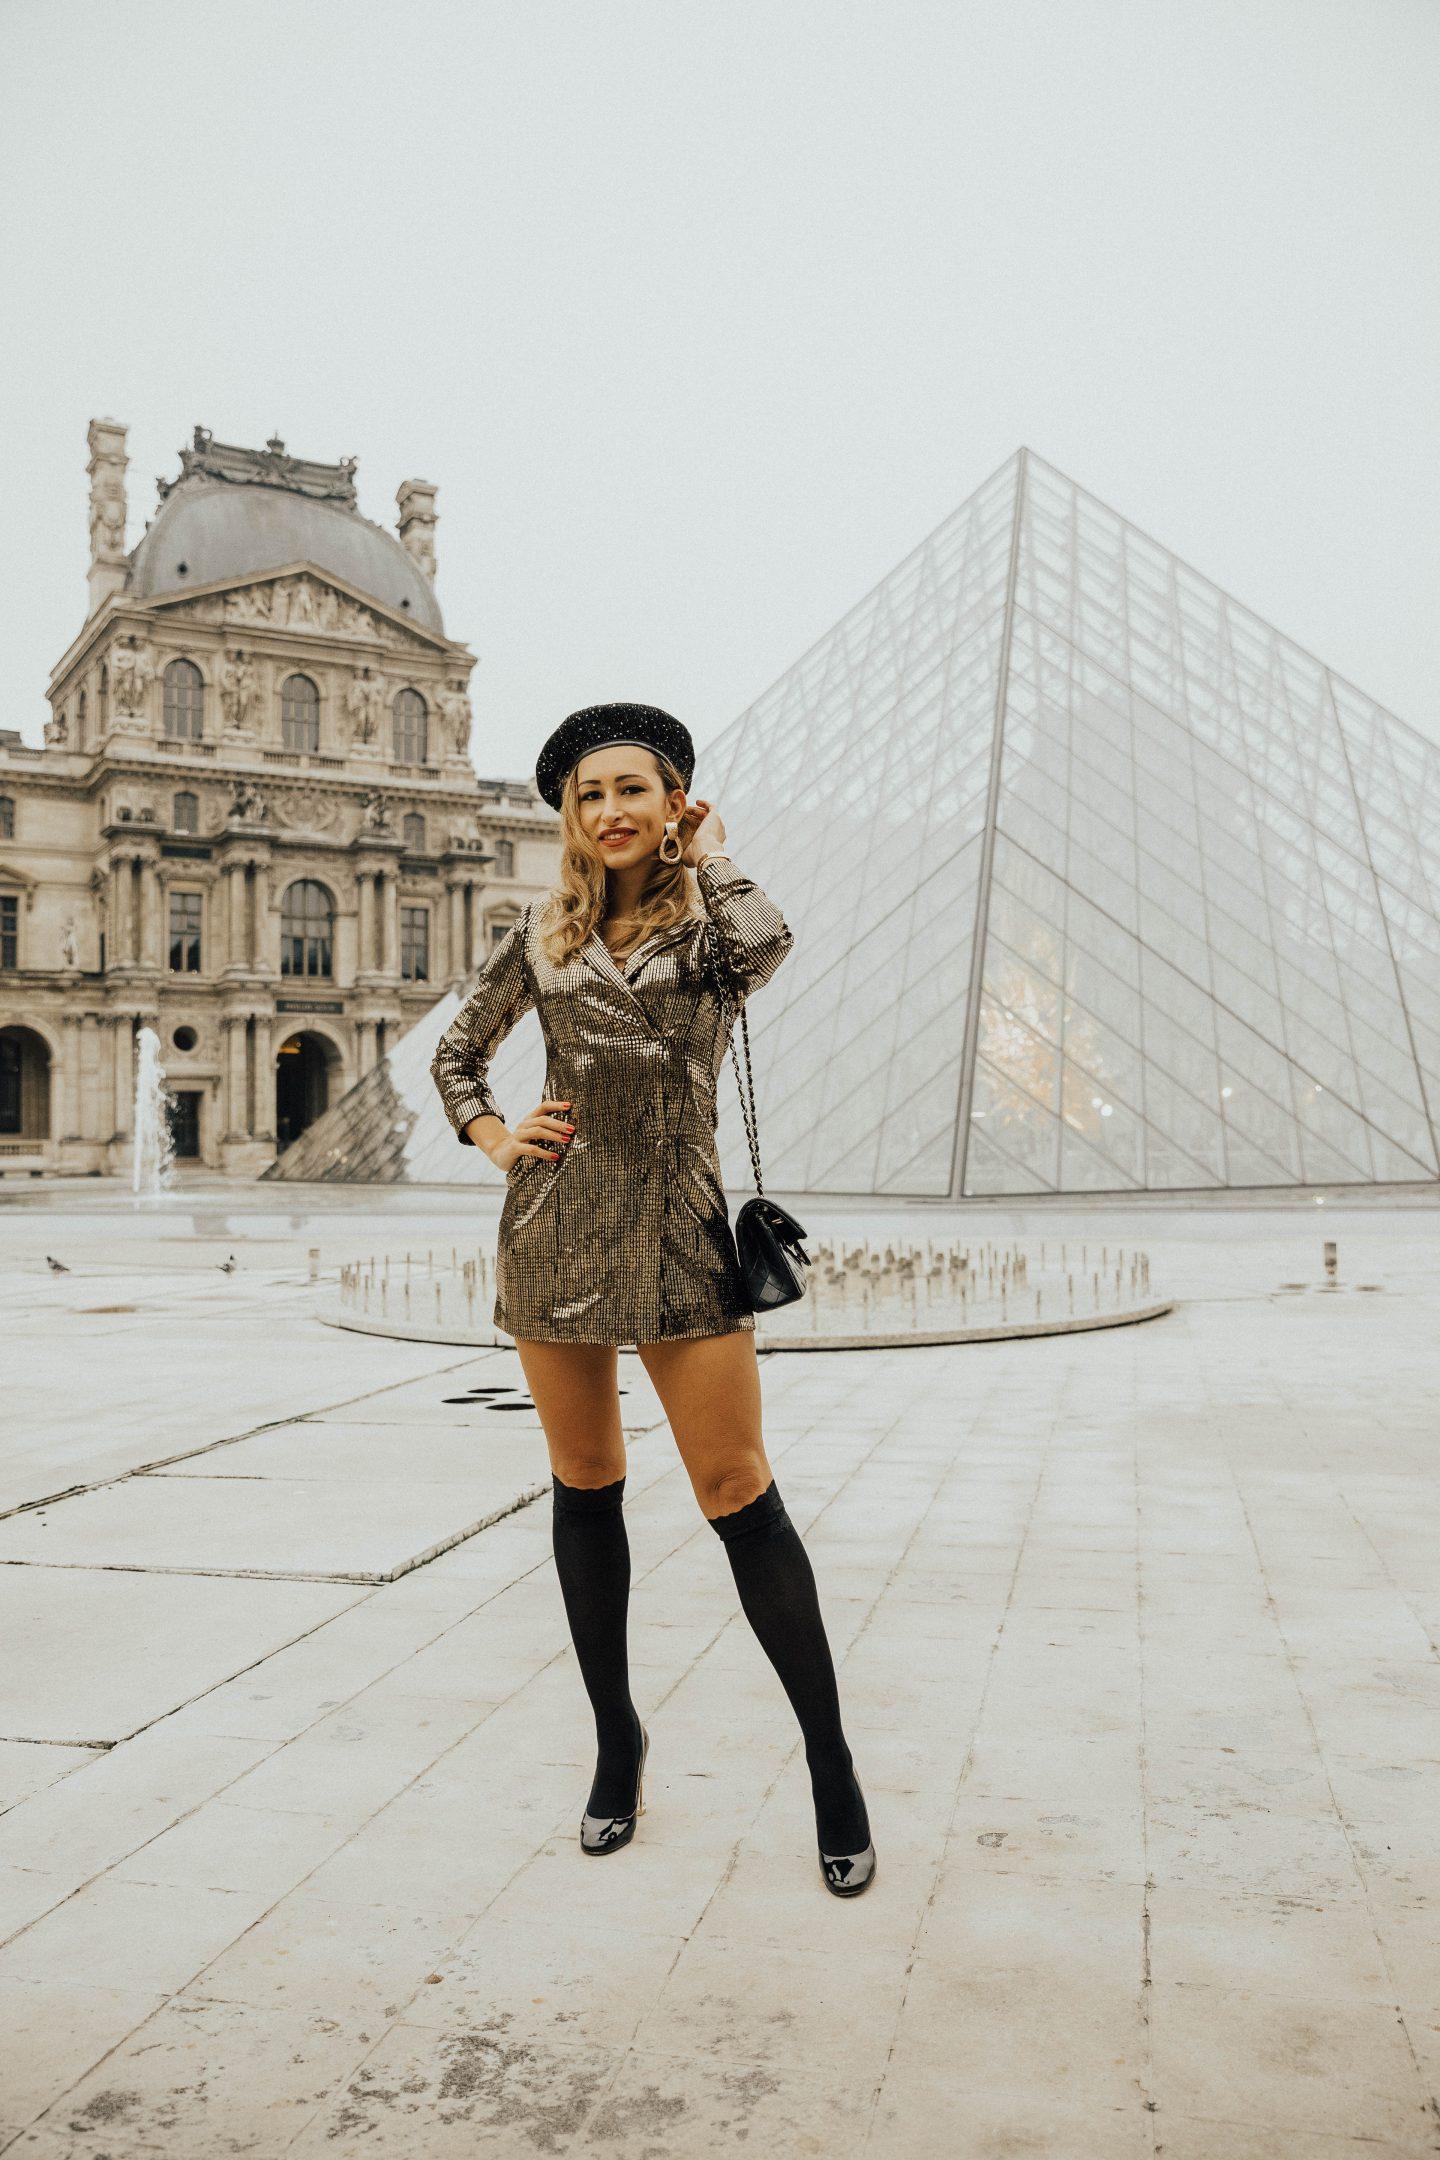 Festive Season in Paris